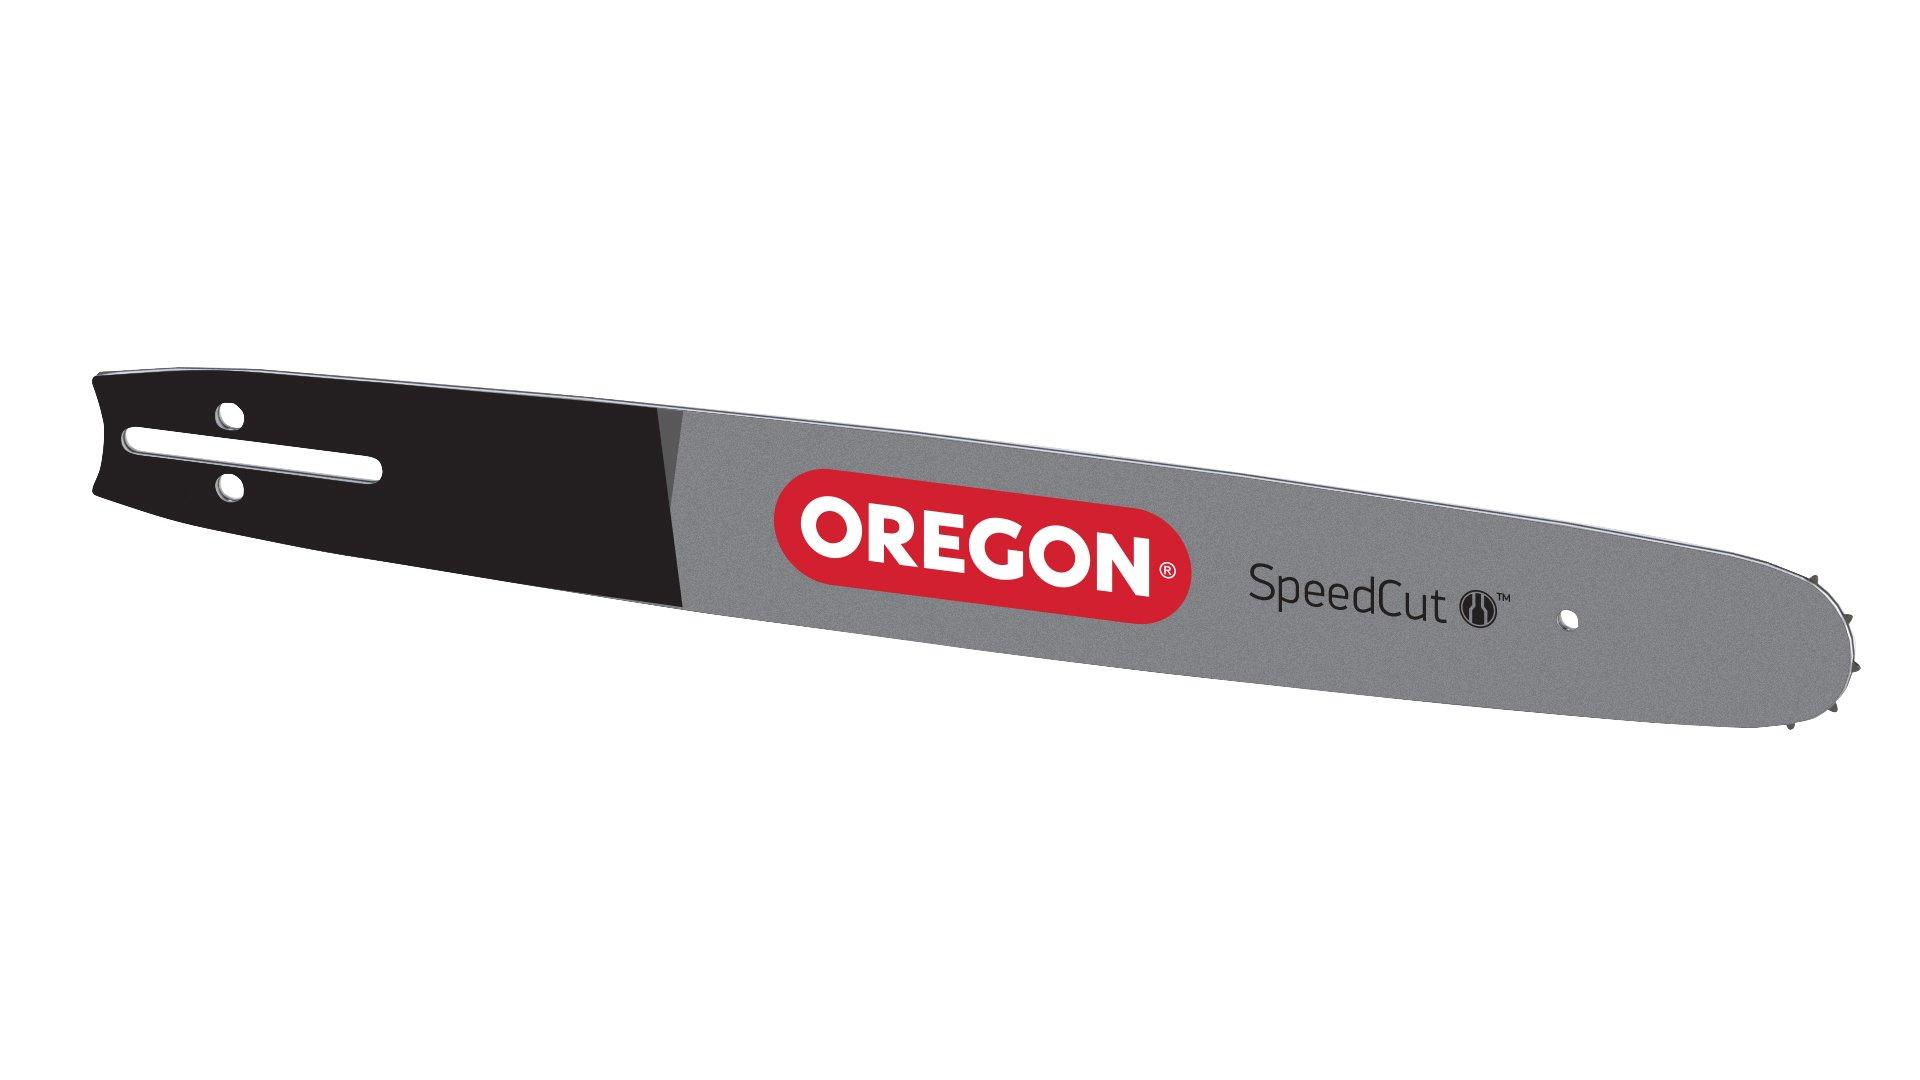 Oregon 200TXLBK095 .050'' Gauge .325'' Pitch 20'' SpeedCut Guide Bar by Oregon